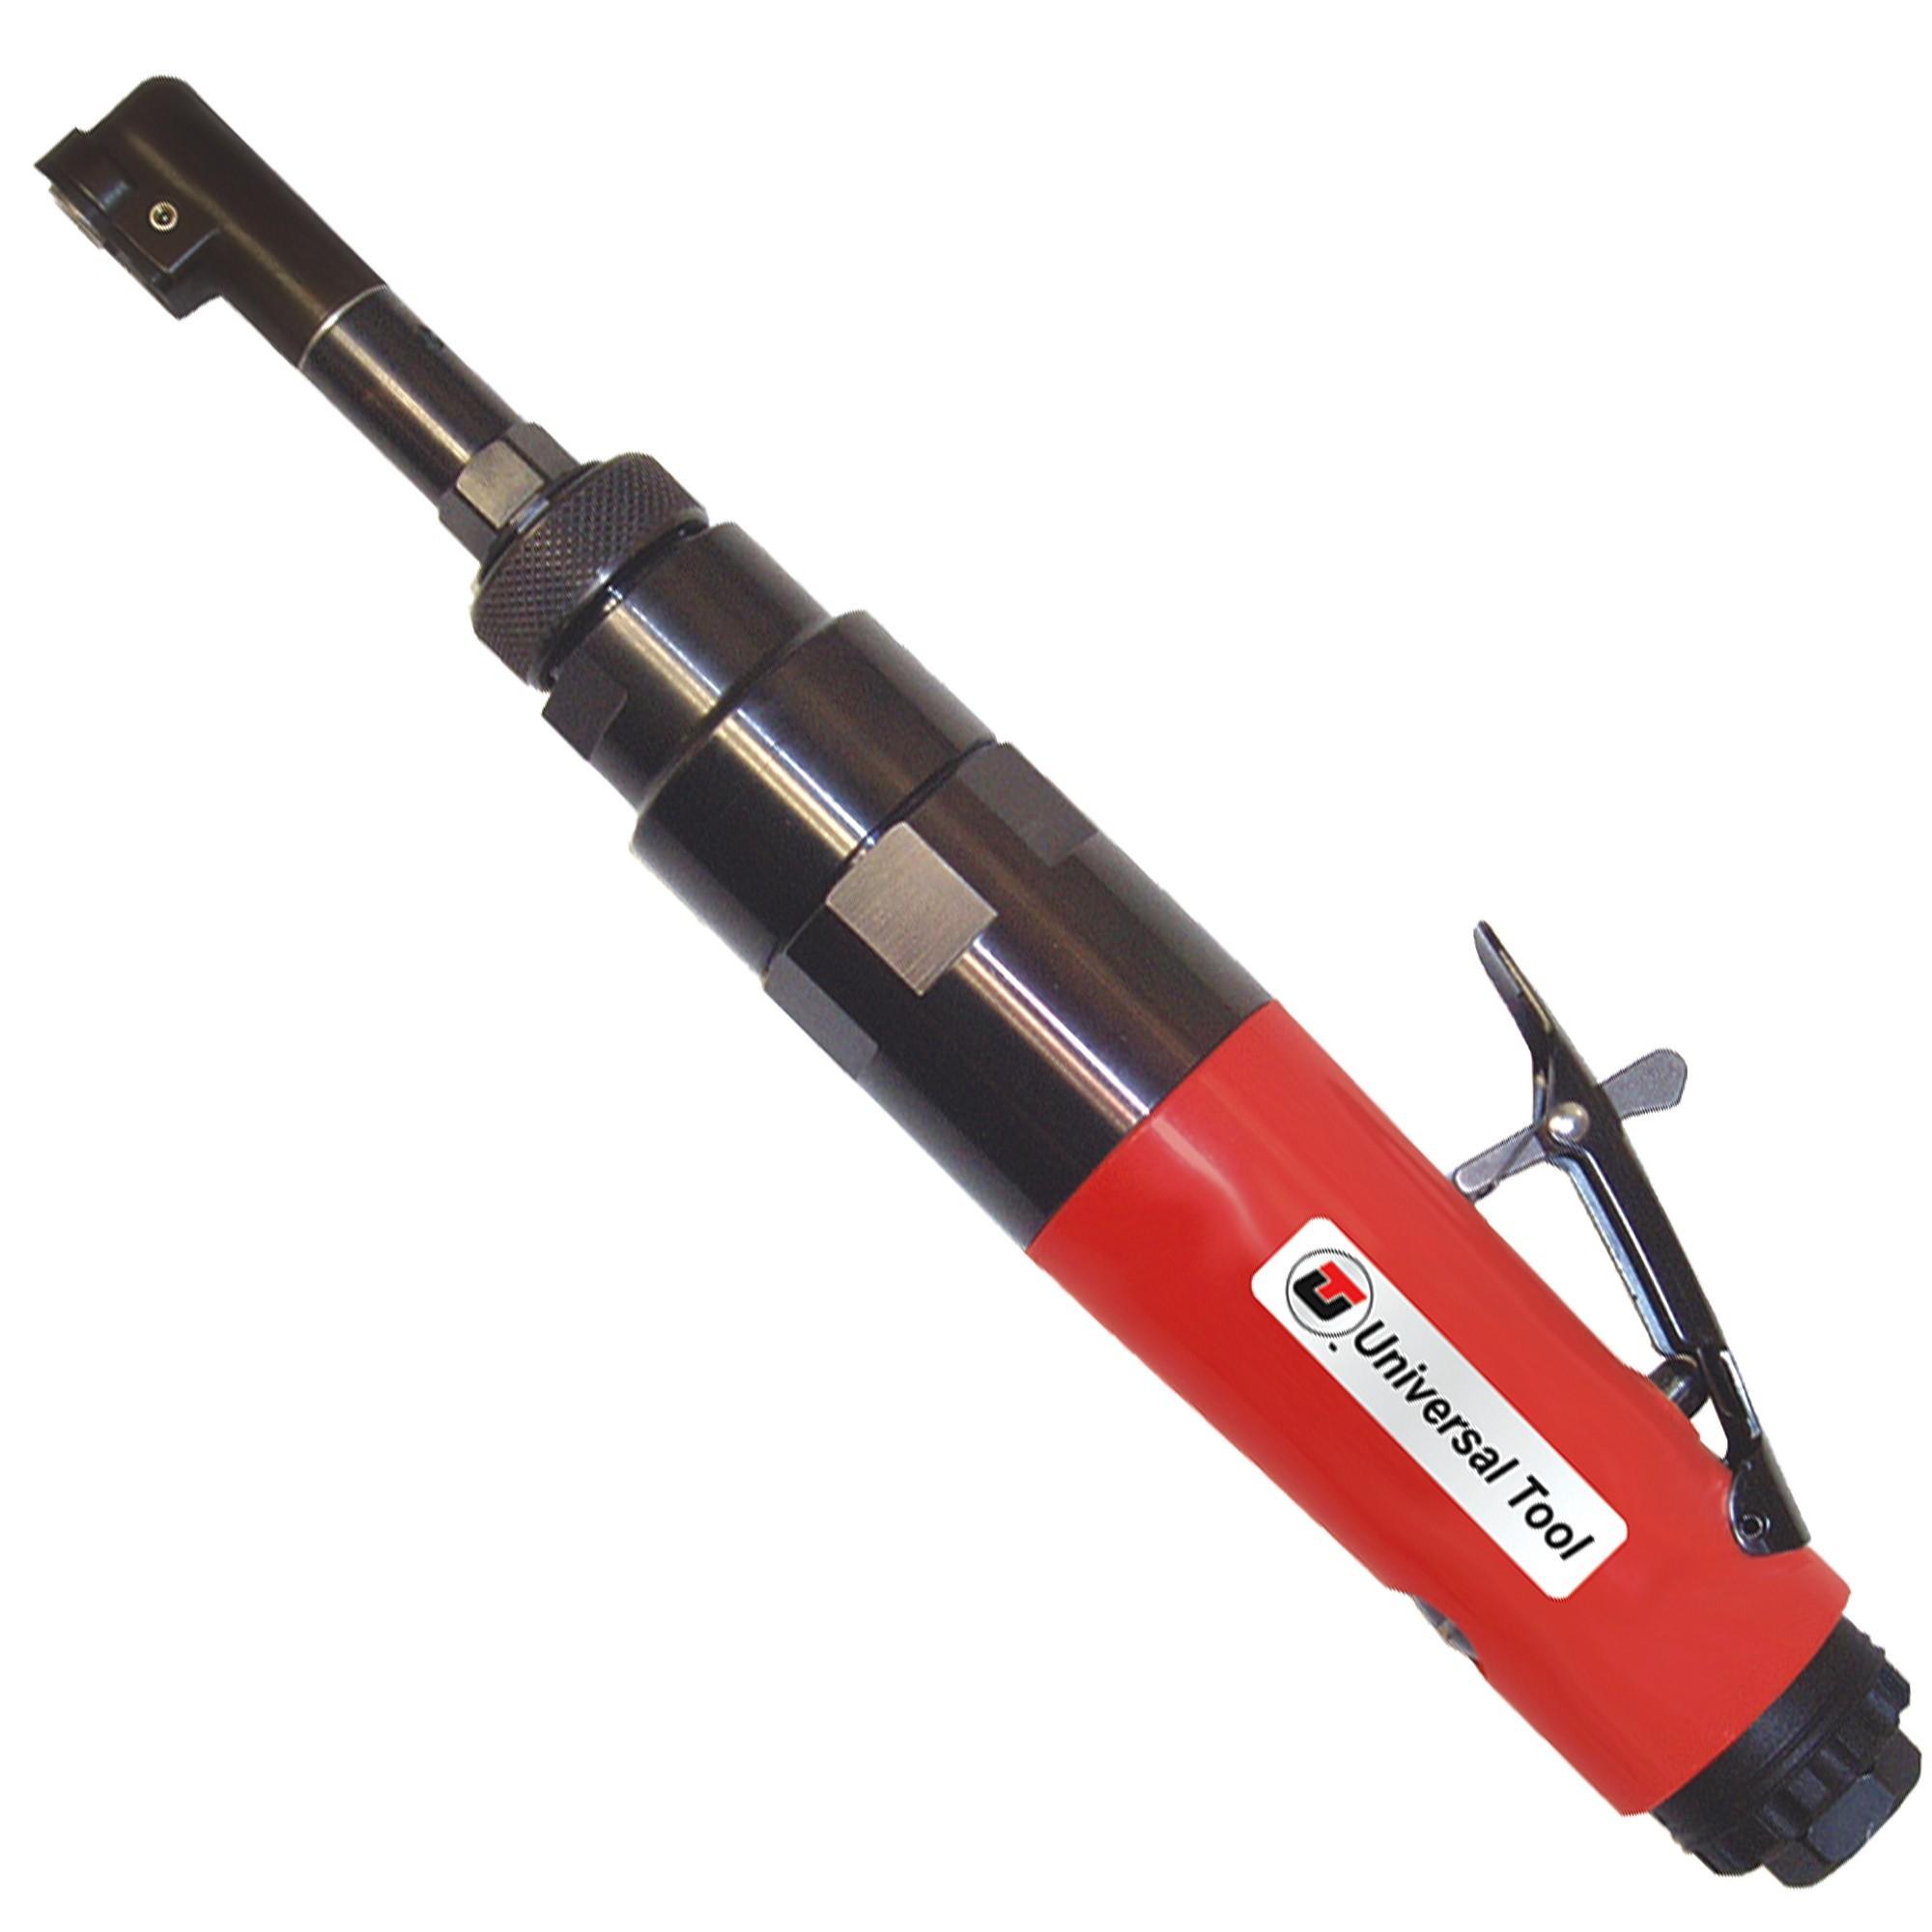 Aircraft Drill Motor W/O Angle Head 500 RPM